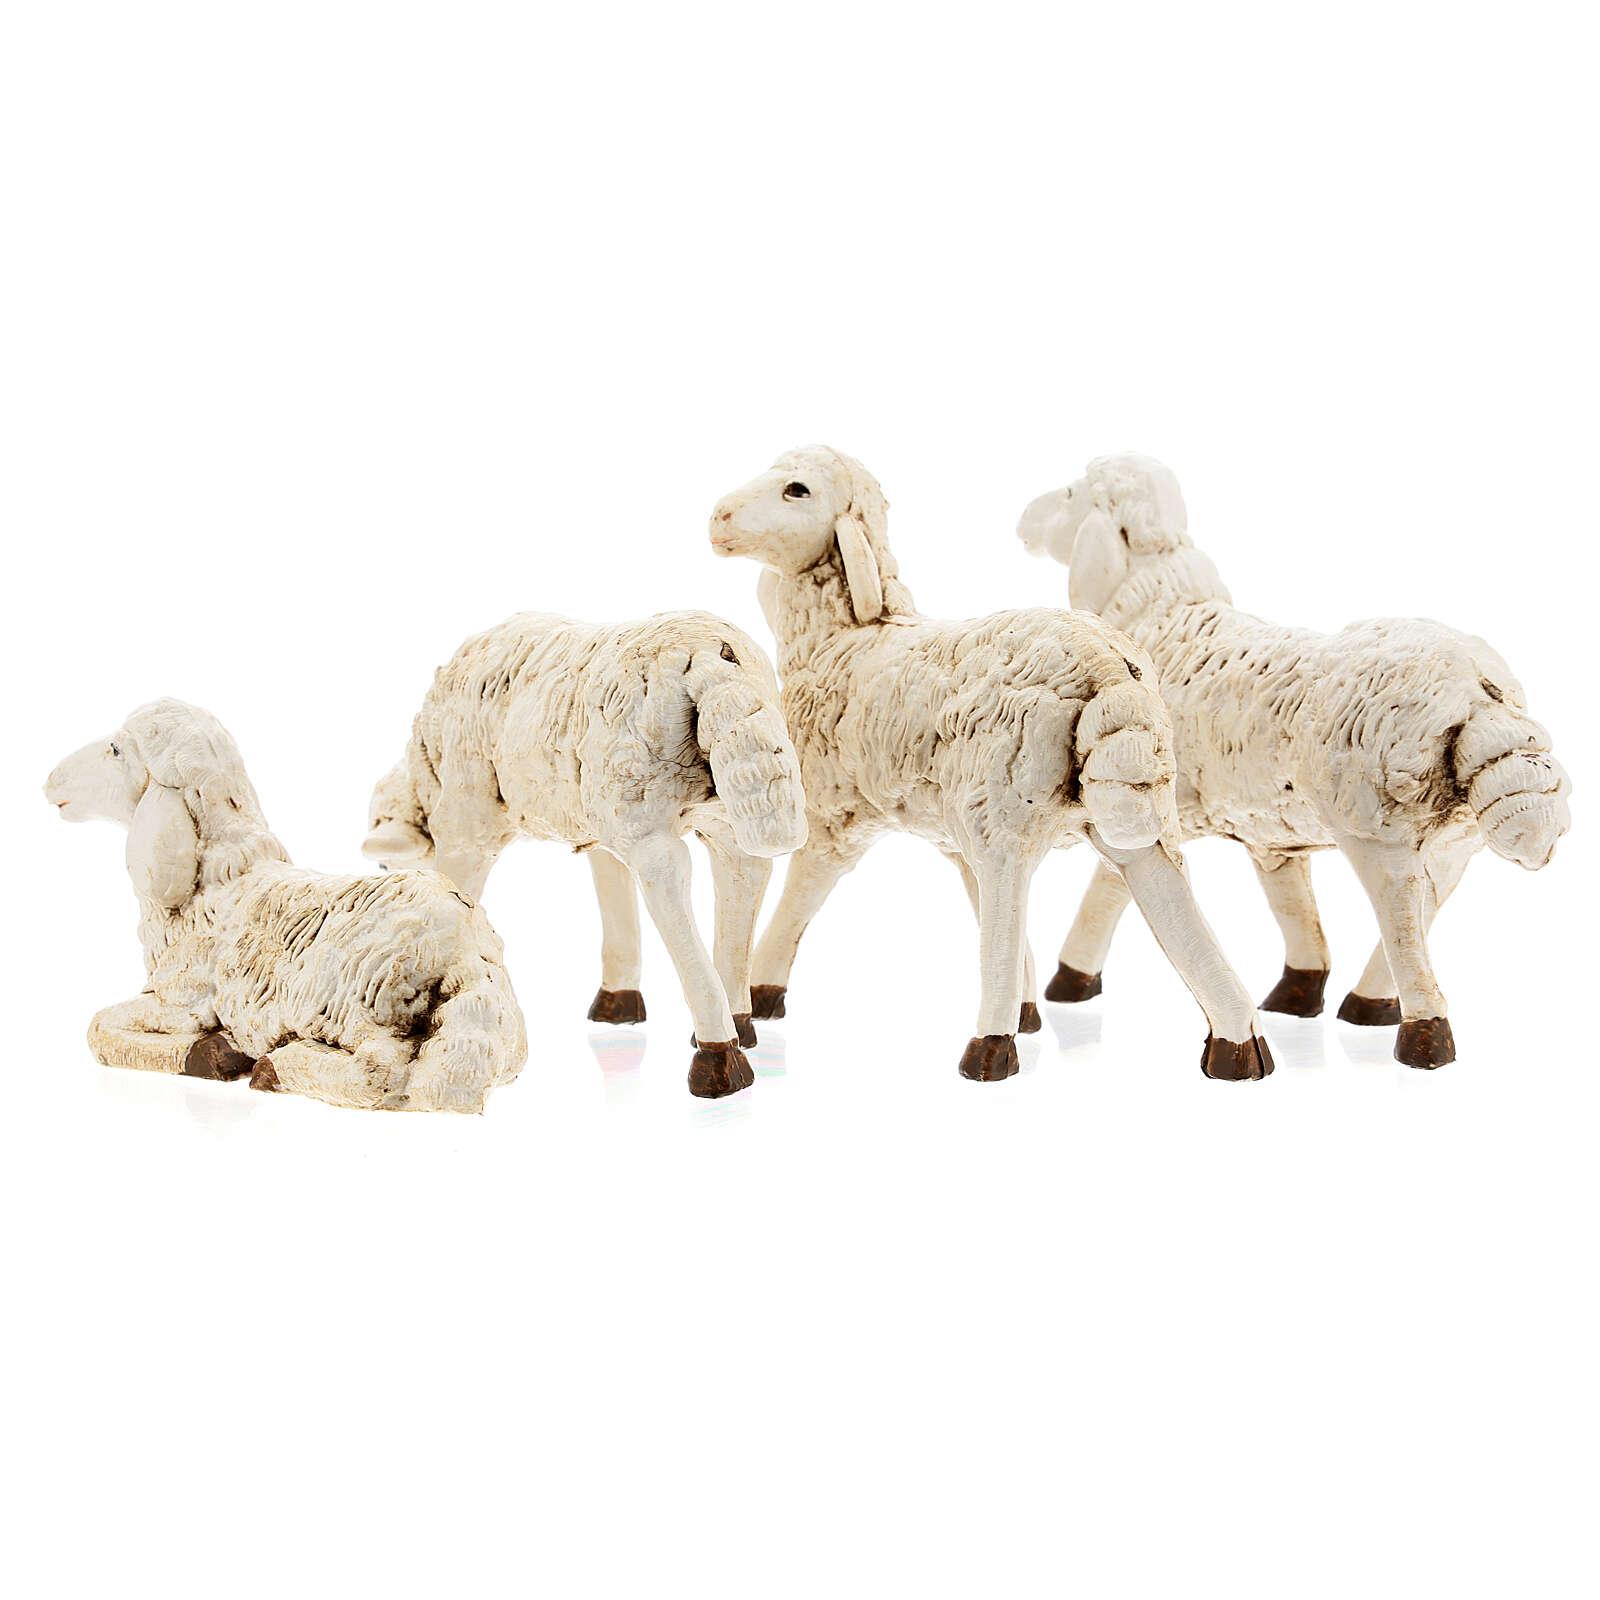 Nativity scene figurines, plastic sheep, 4 pieces 20cm 3